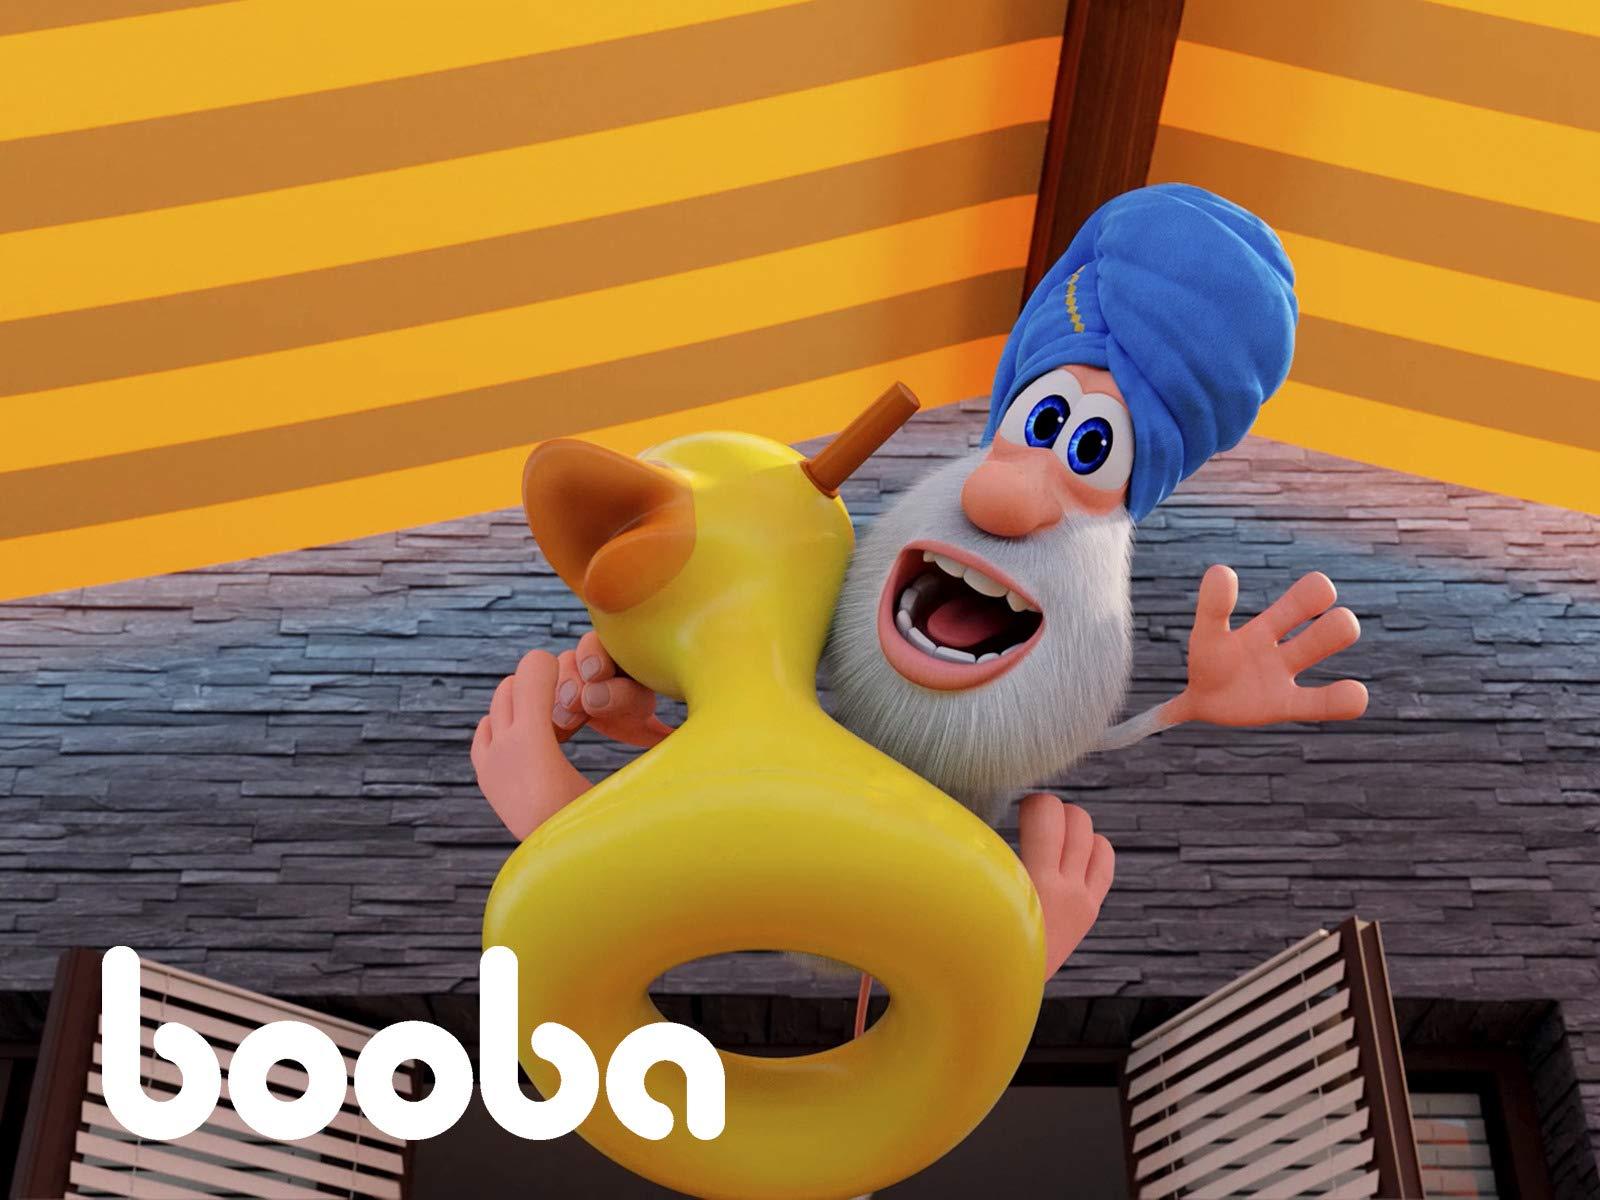 Booba Eyes Meme / Booba Juice : Booba Gift Shop Episode 45 ...